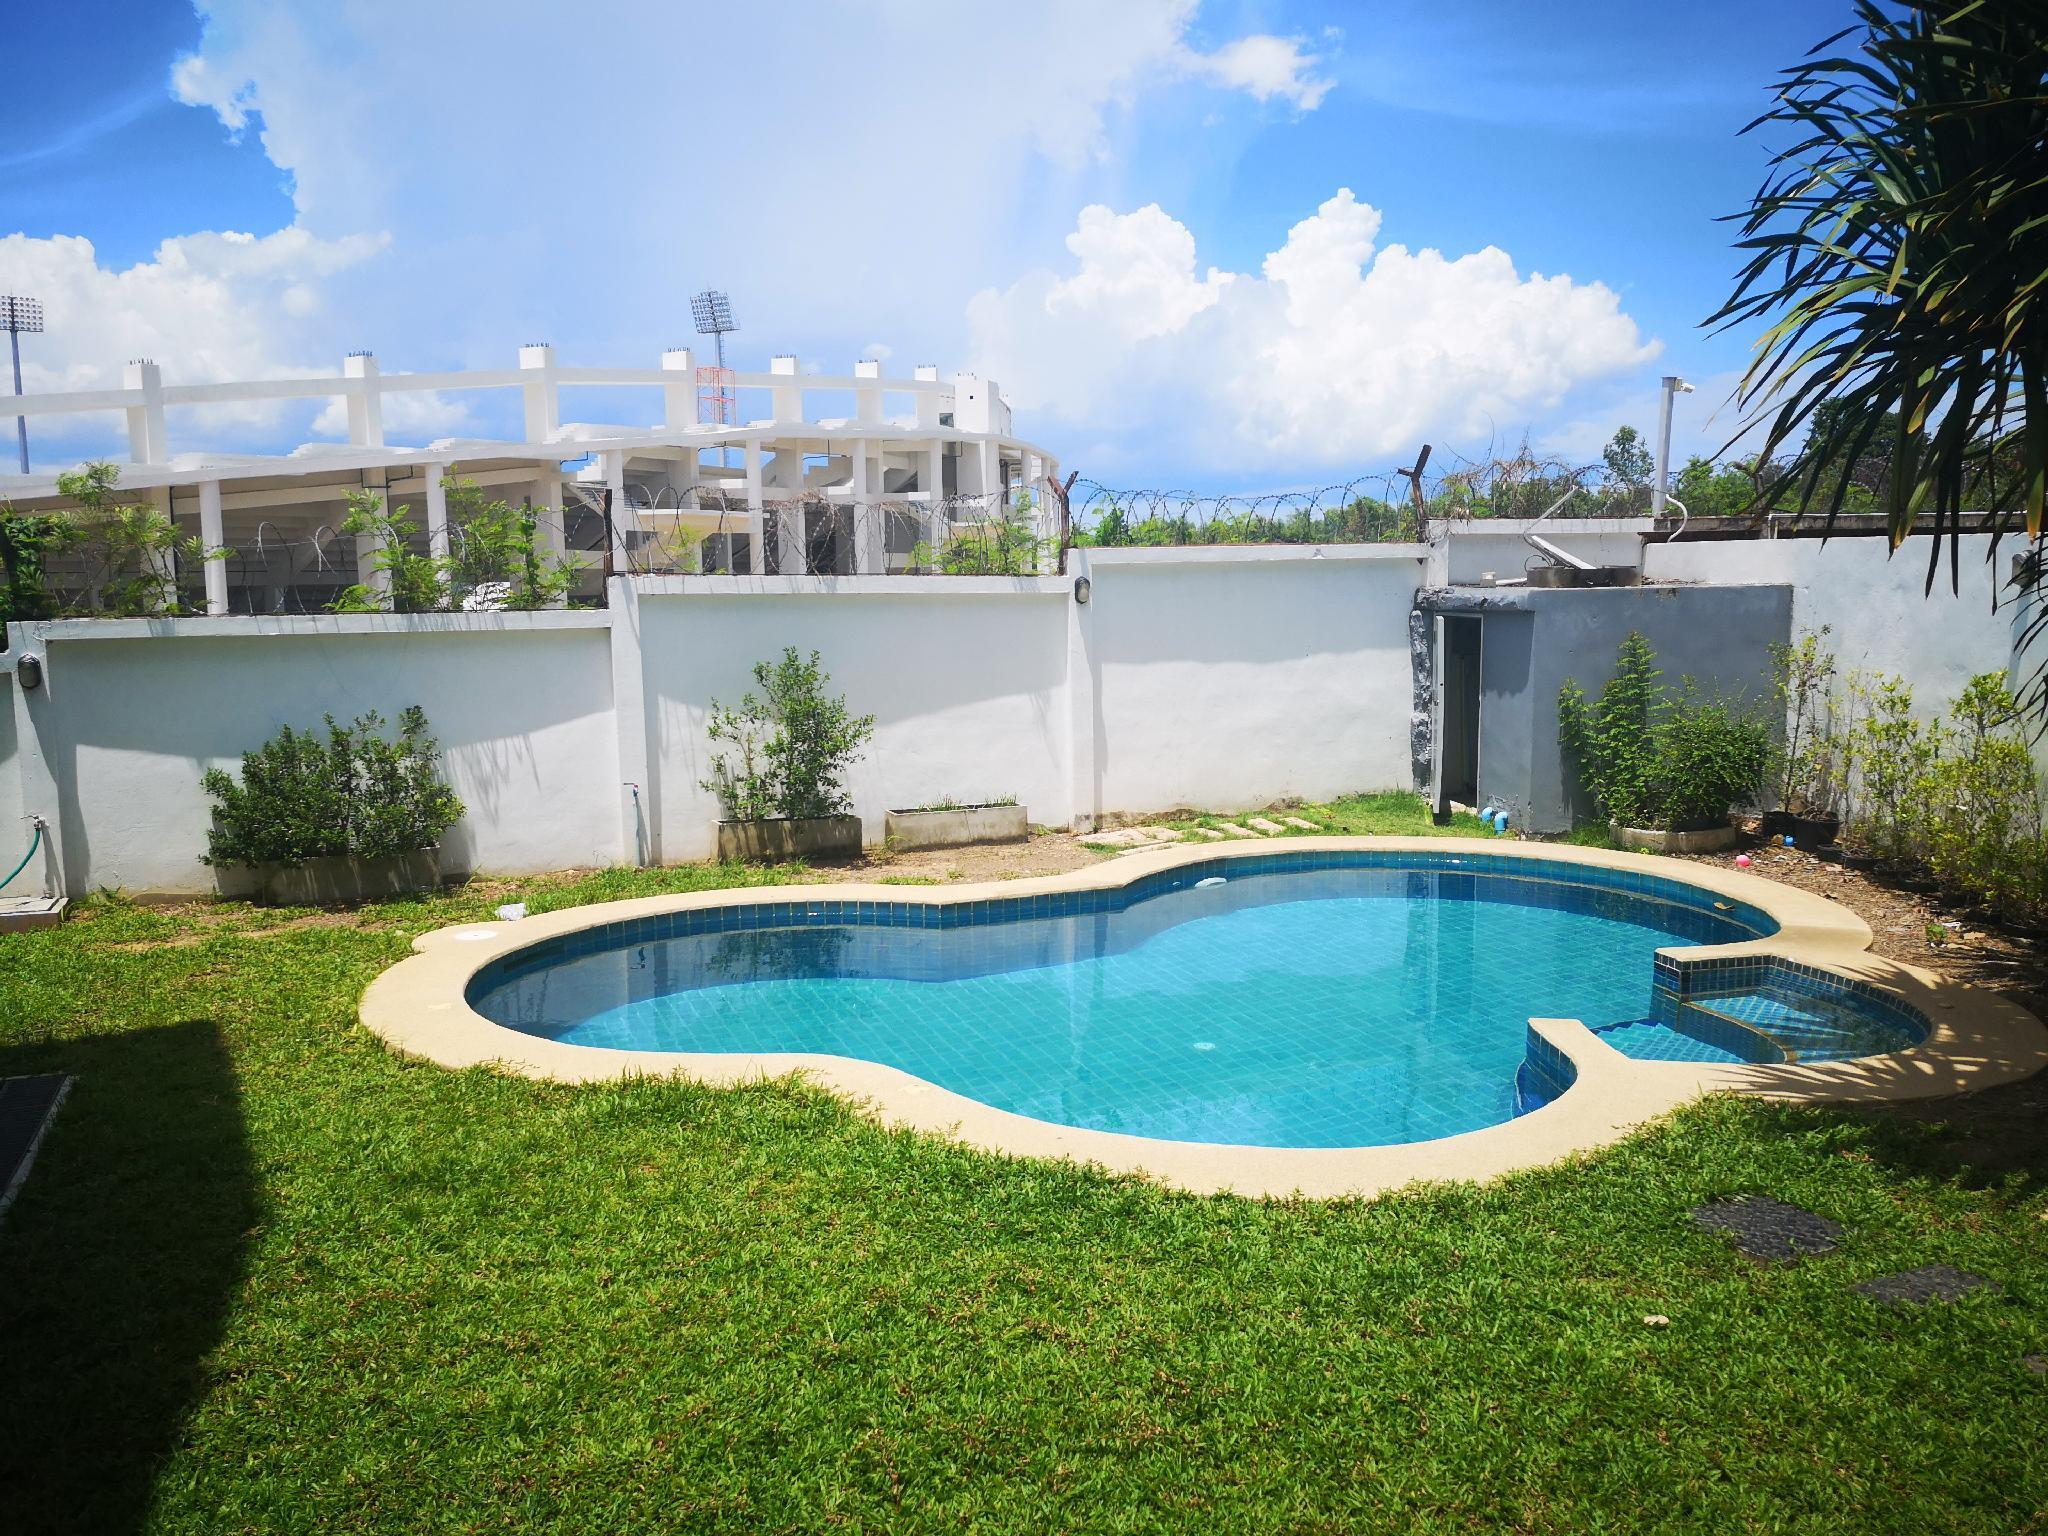 The warmest swimming pool villa in Pattaya วิลลา 5 ห้องนอน 5 ห้องน้ำส่วนตัว ขนาด 300 ตร.ม. – เขาตาโล